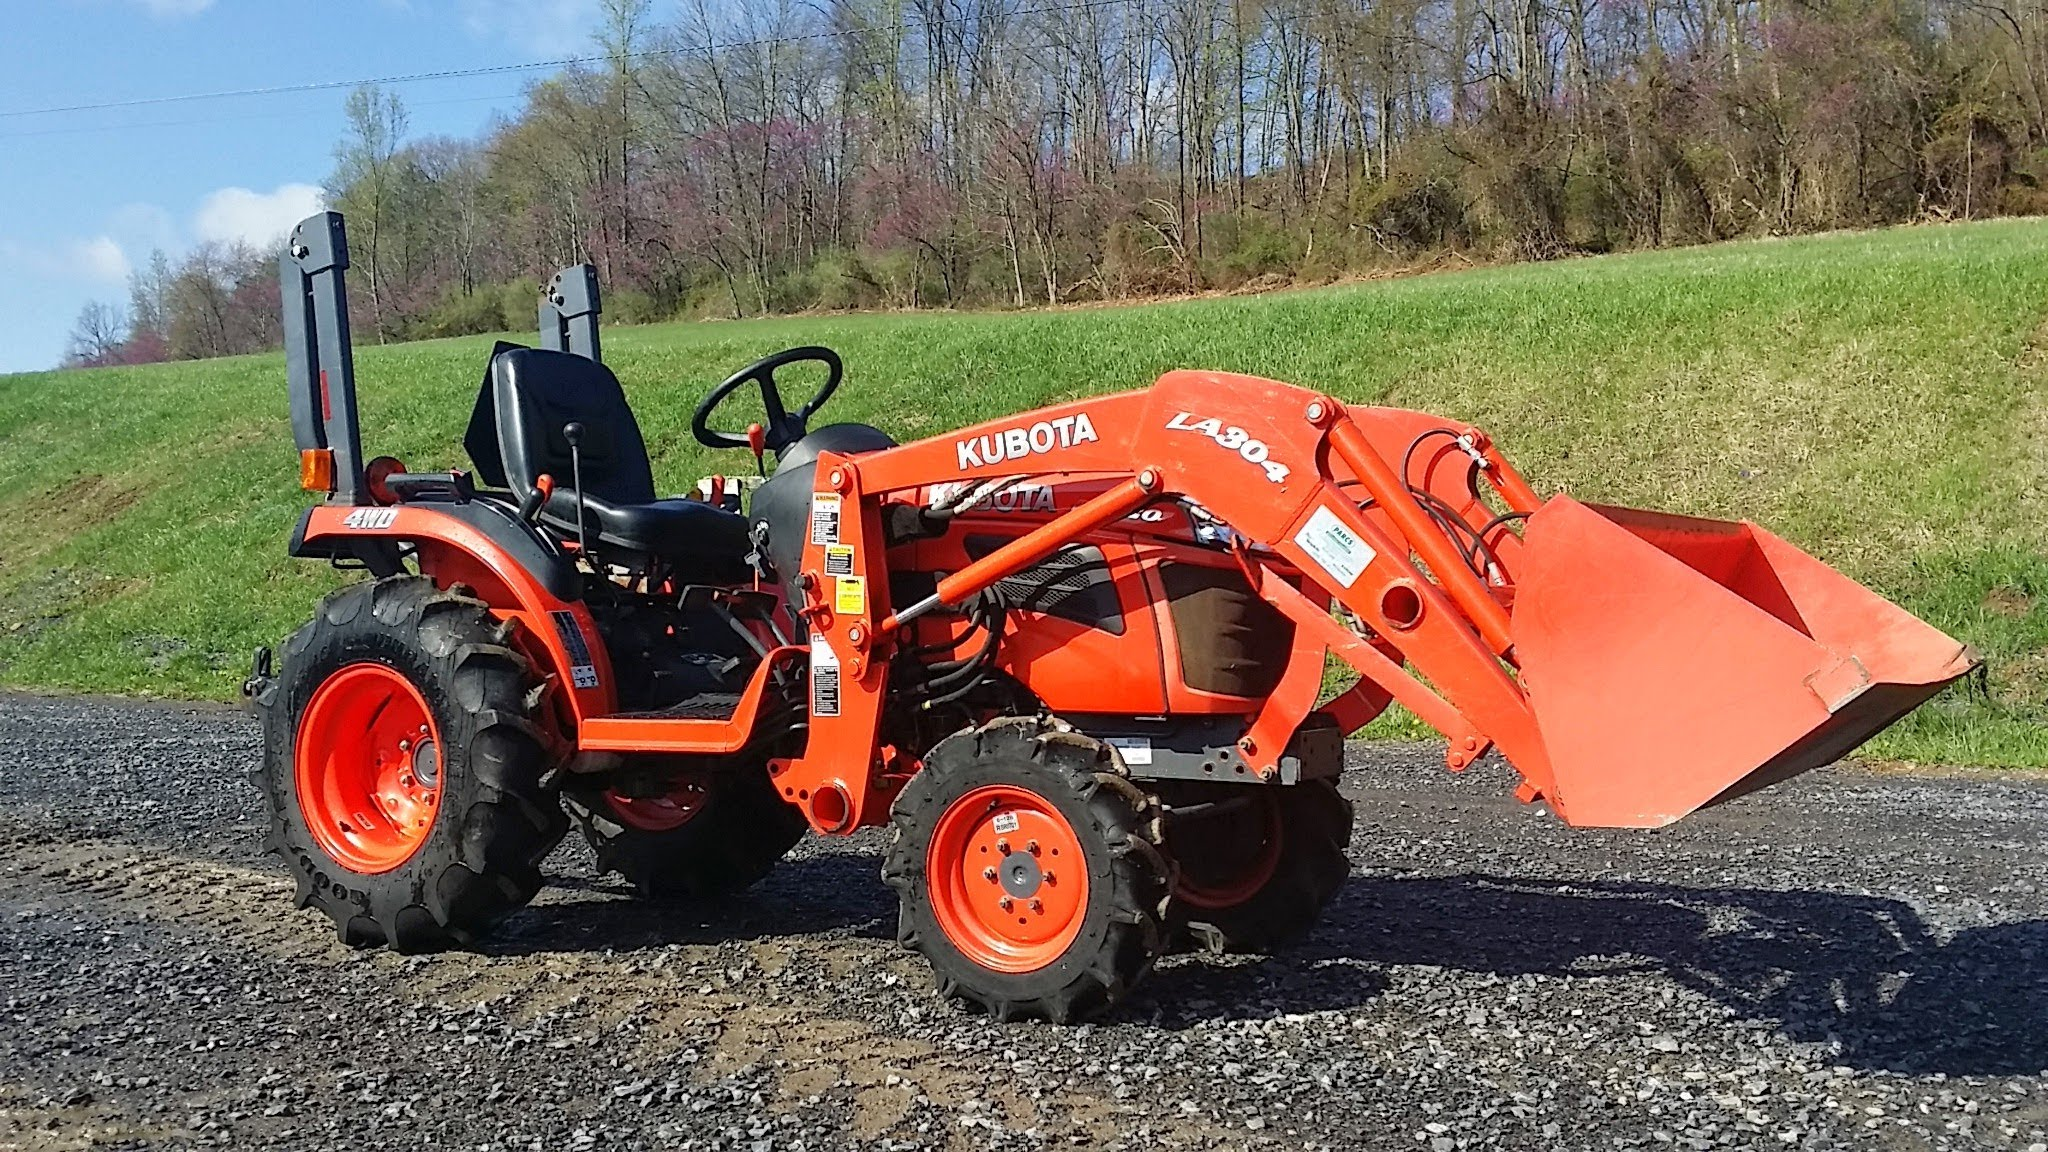 Kubota B2320 Wiring Diagram Problems Diagrams York D4cg120n20025eca Schematic Farm Tractor Tractors B2920 Diesel